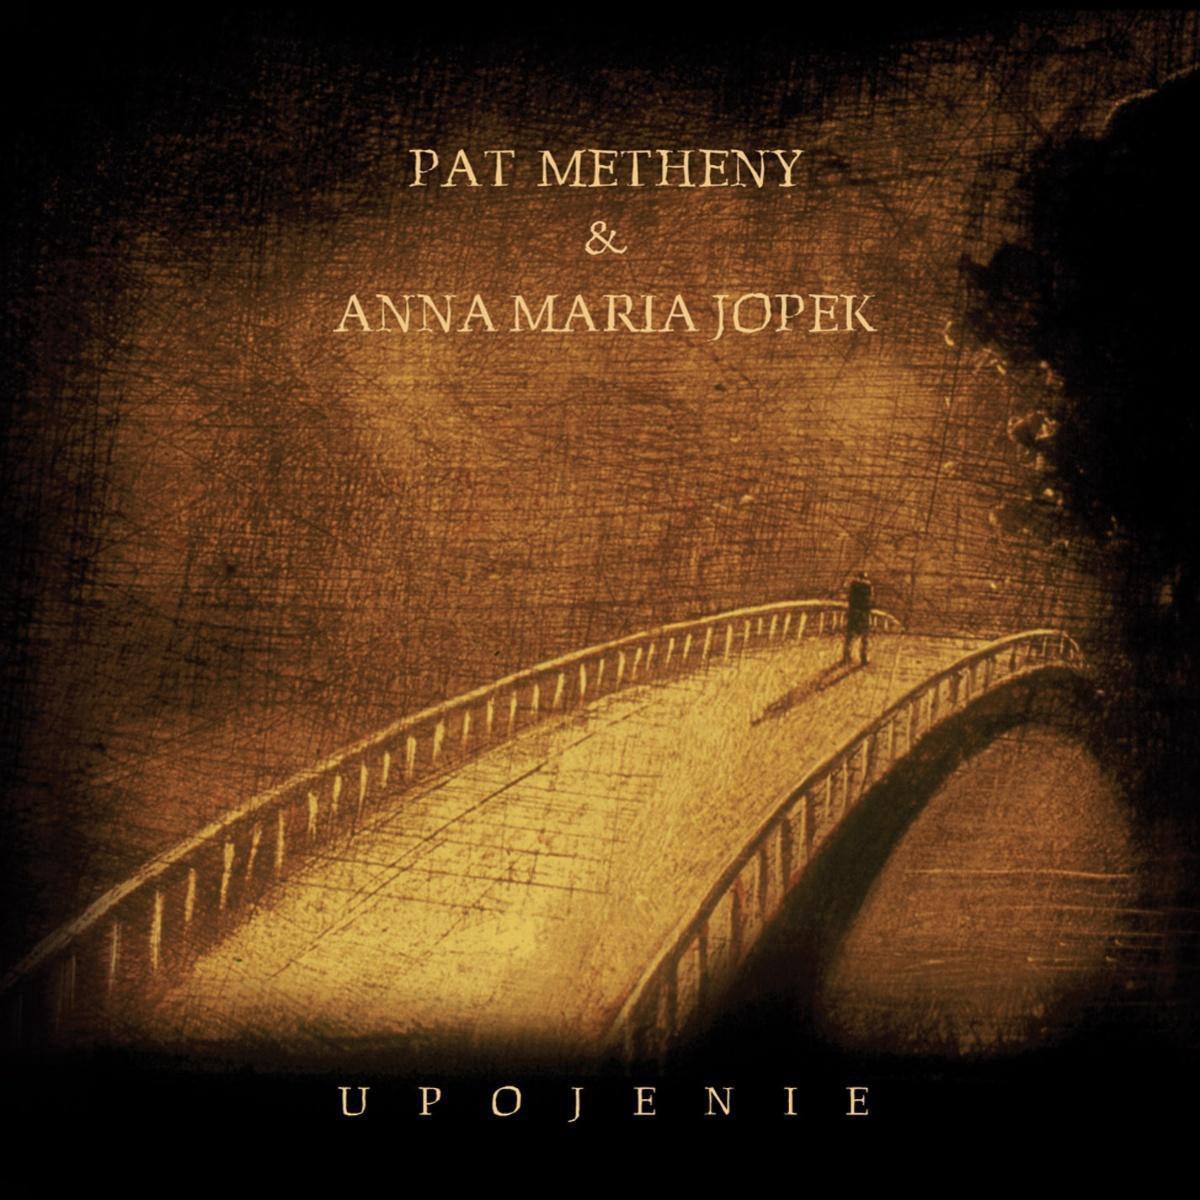 Upojenie - Pat Metheny